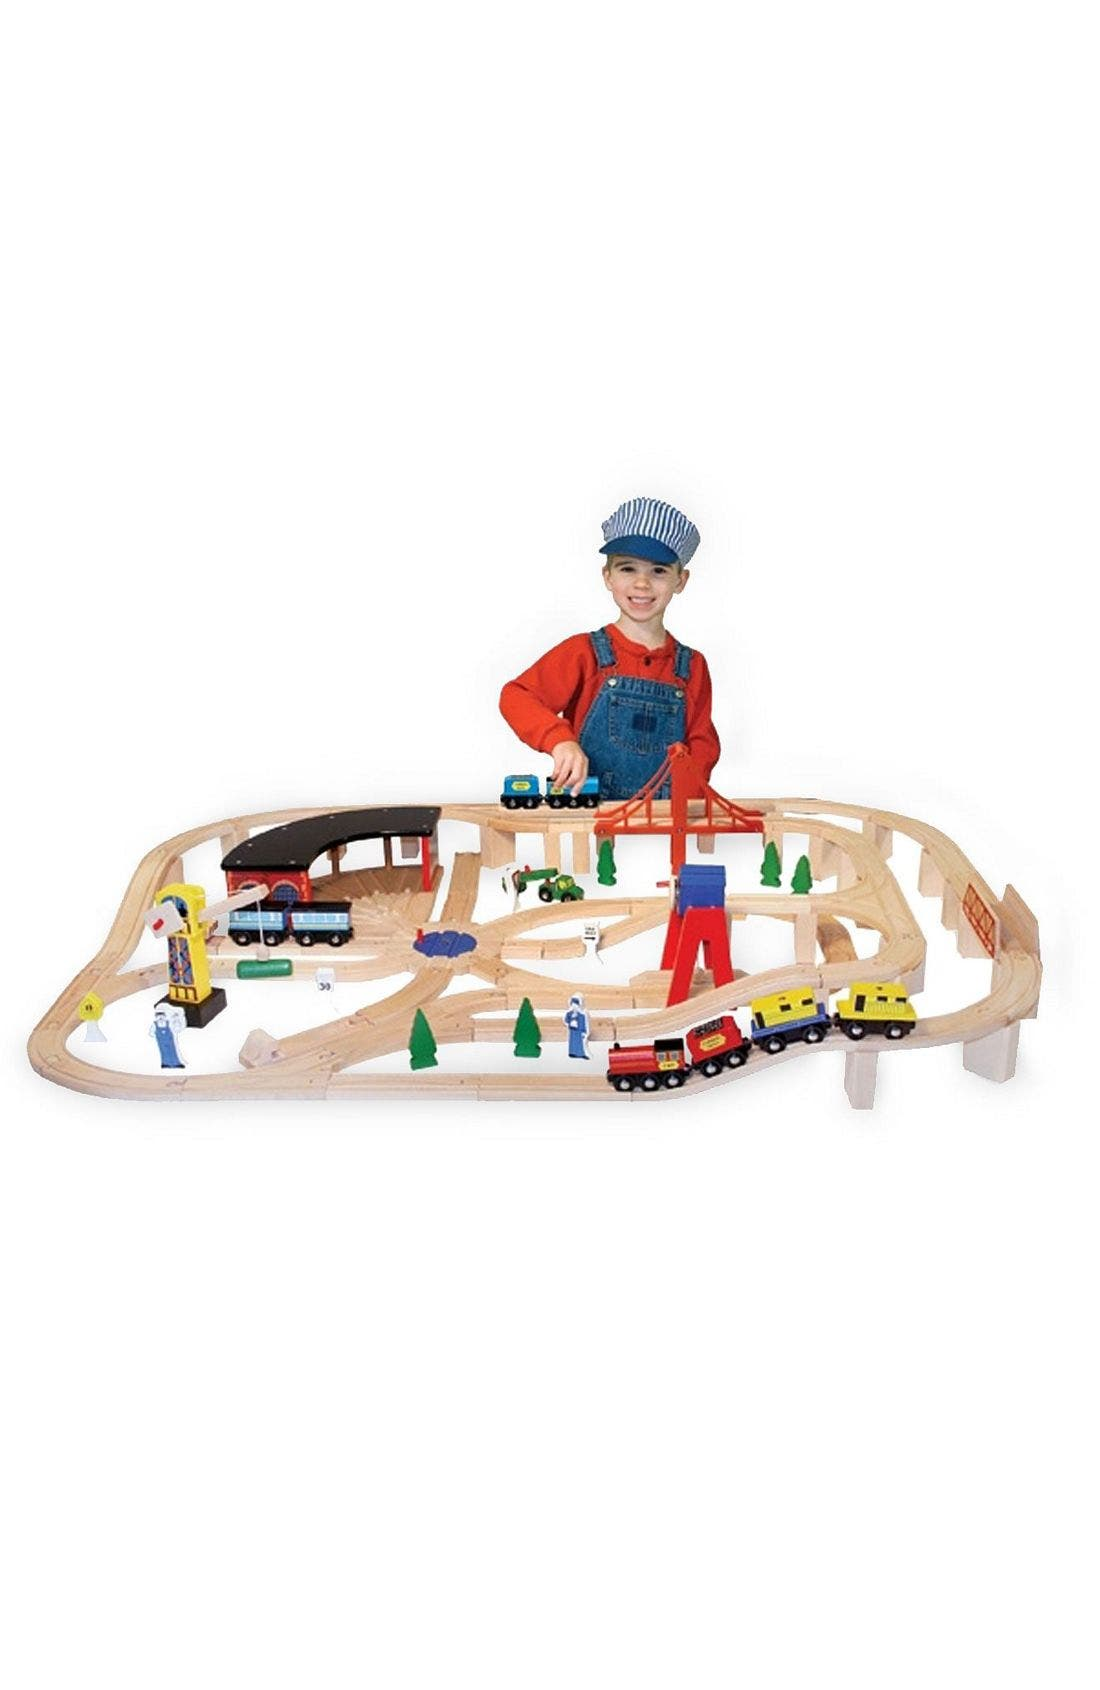 Alternate Image 1 Selected - Melissa & Doug 132-Piece Wooden Railway Set